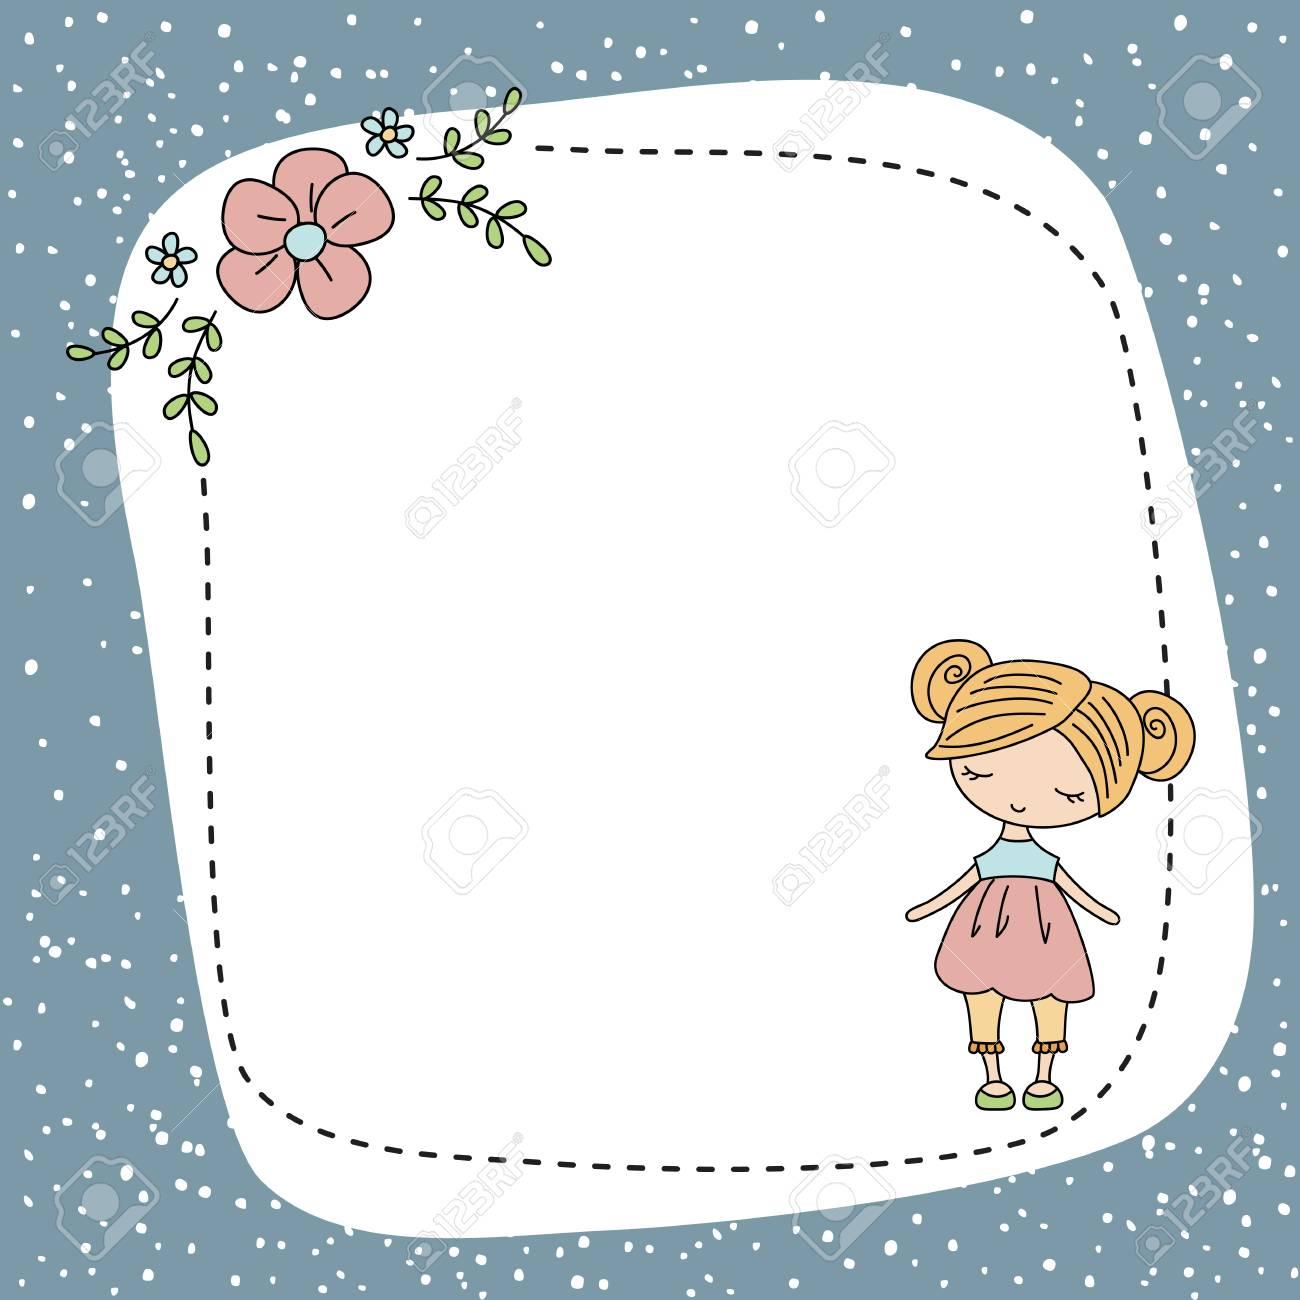 dessin carte de voeux Jolie Petite Fille. Carte De Voeux Avec La Petite Fille De Dessin